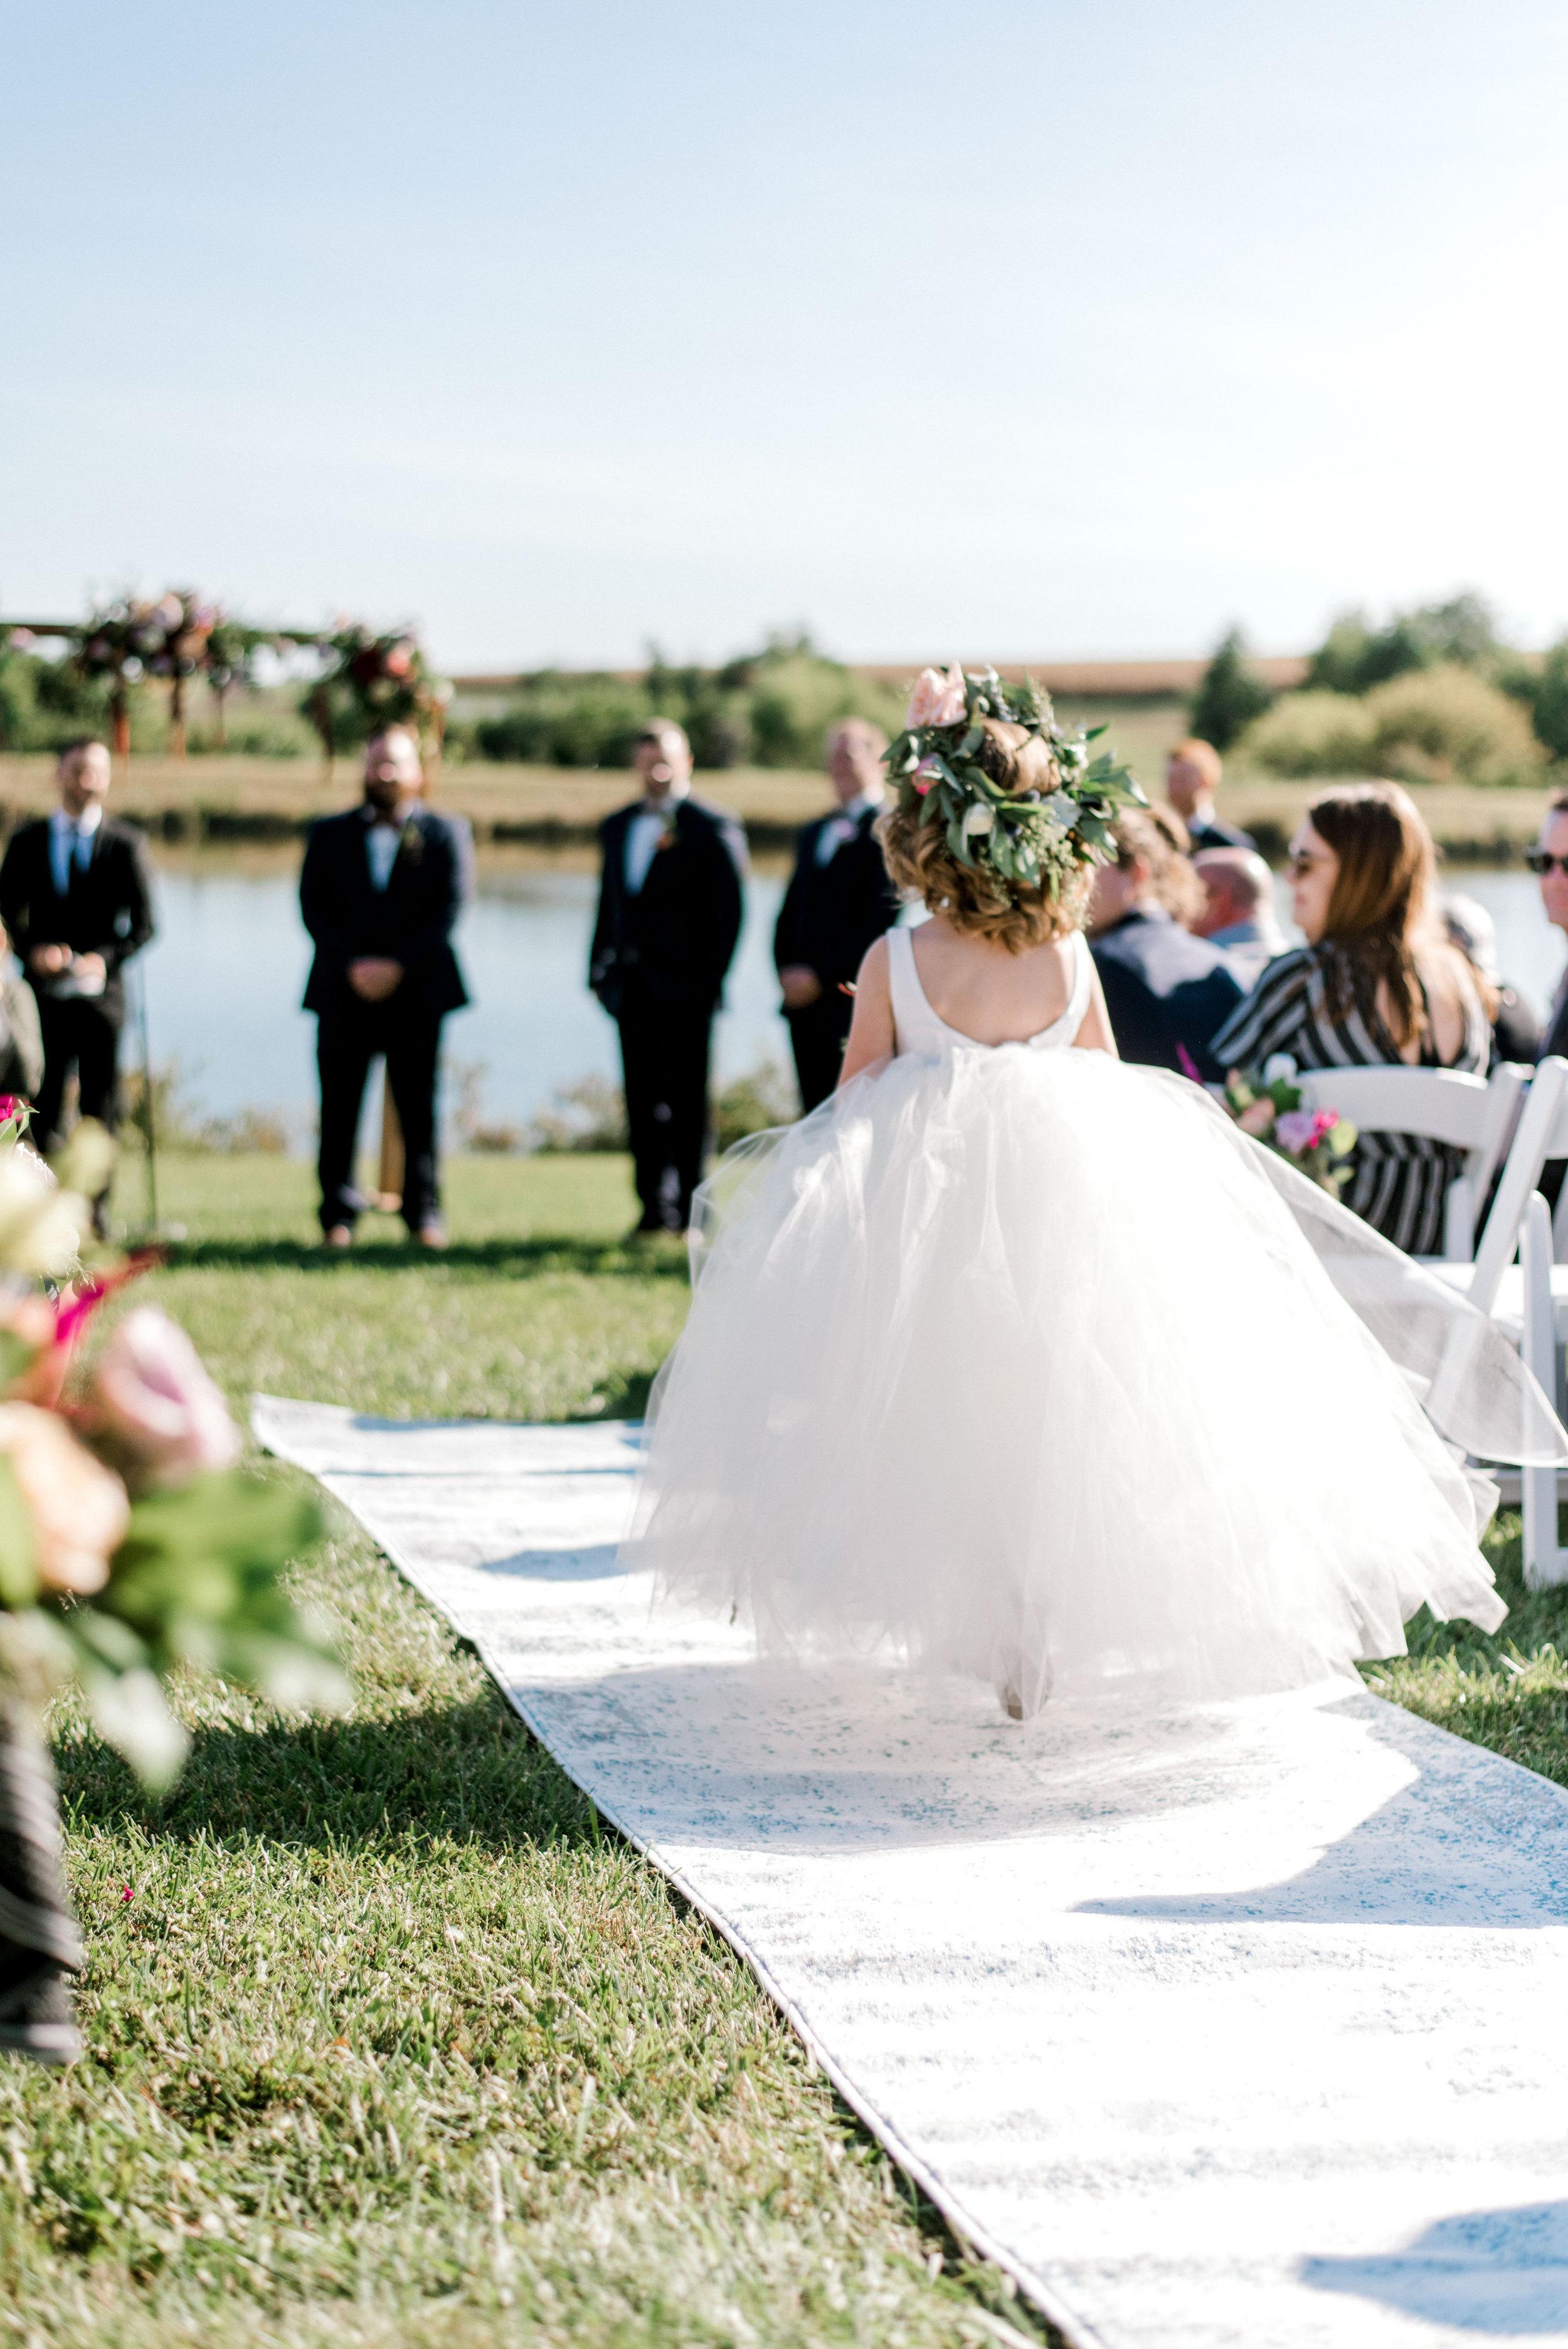 Ryan Alexa Married-Formals Ceremony-0128.jpg